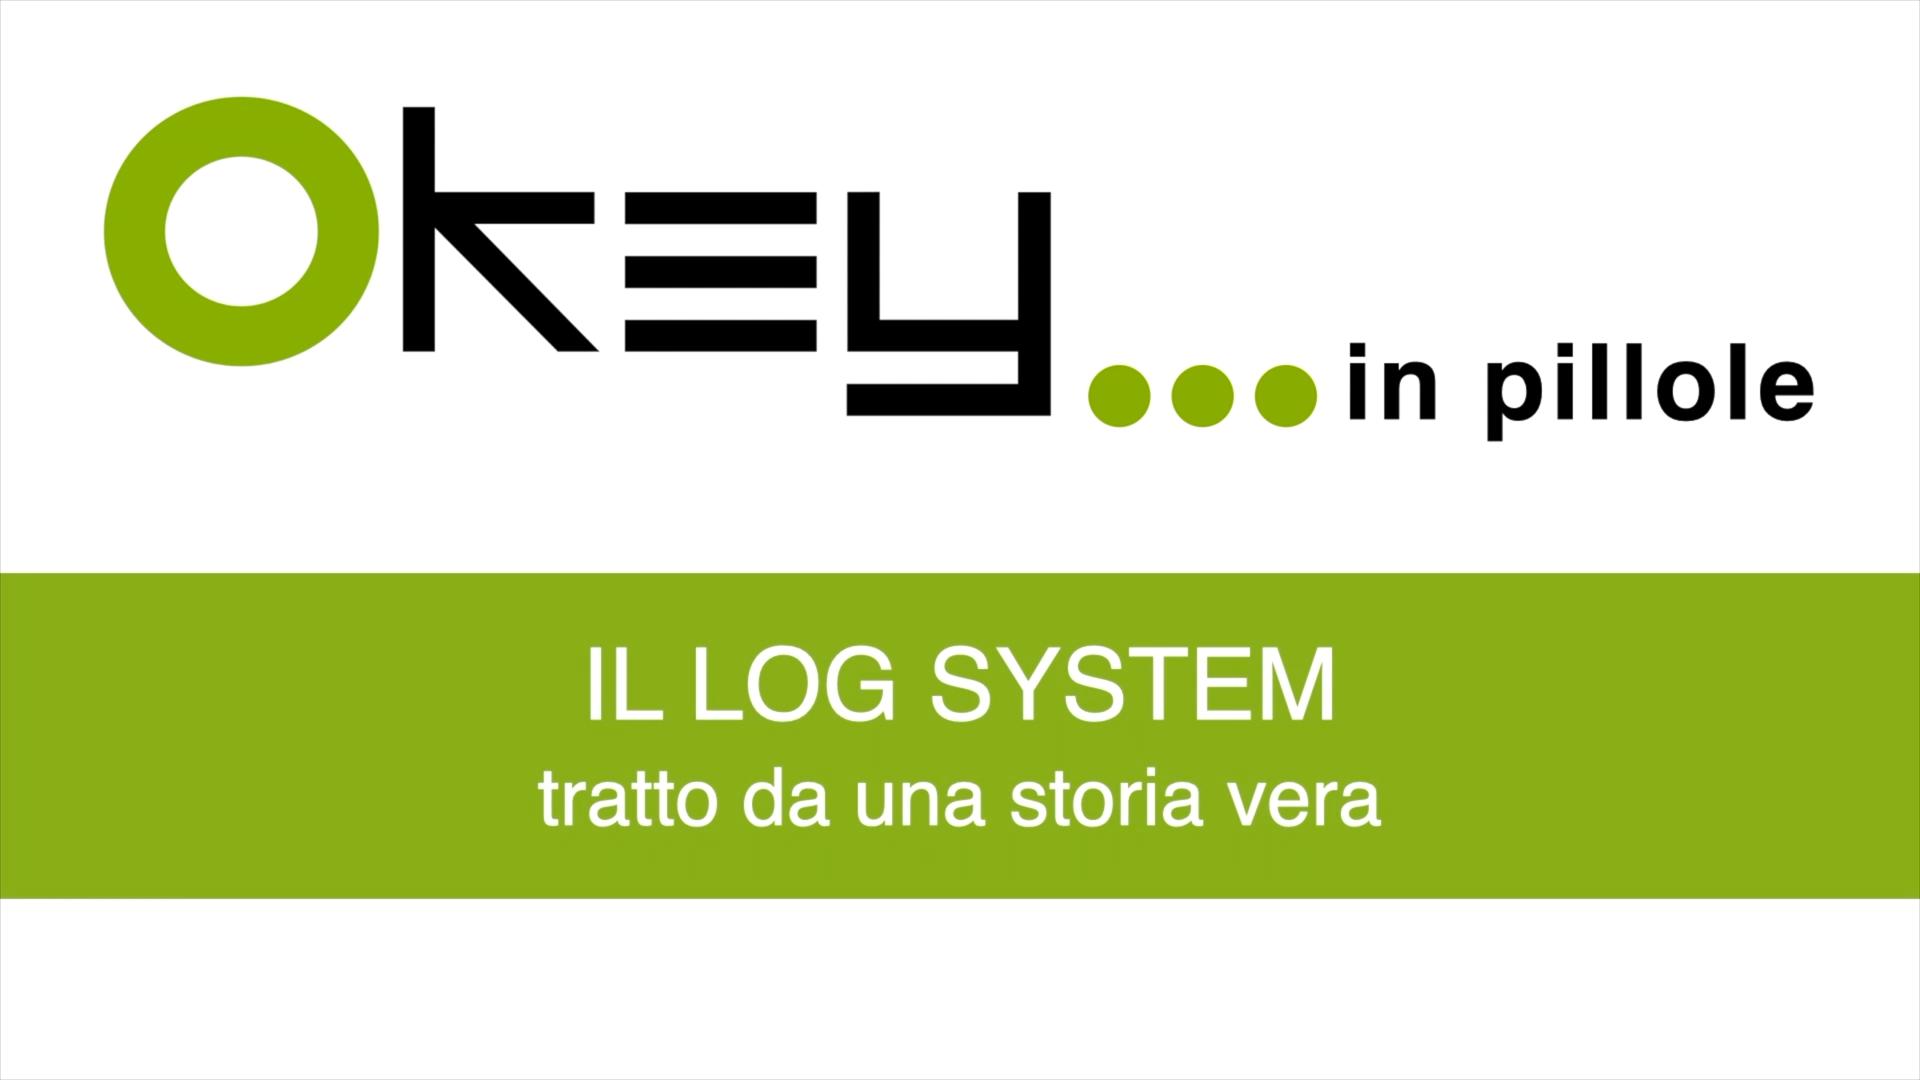 01 LOG System